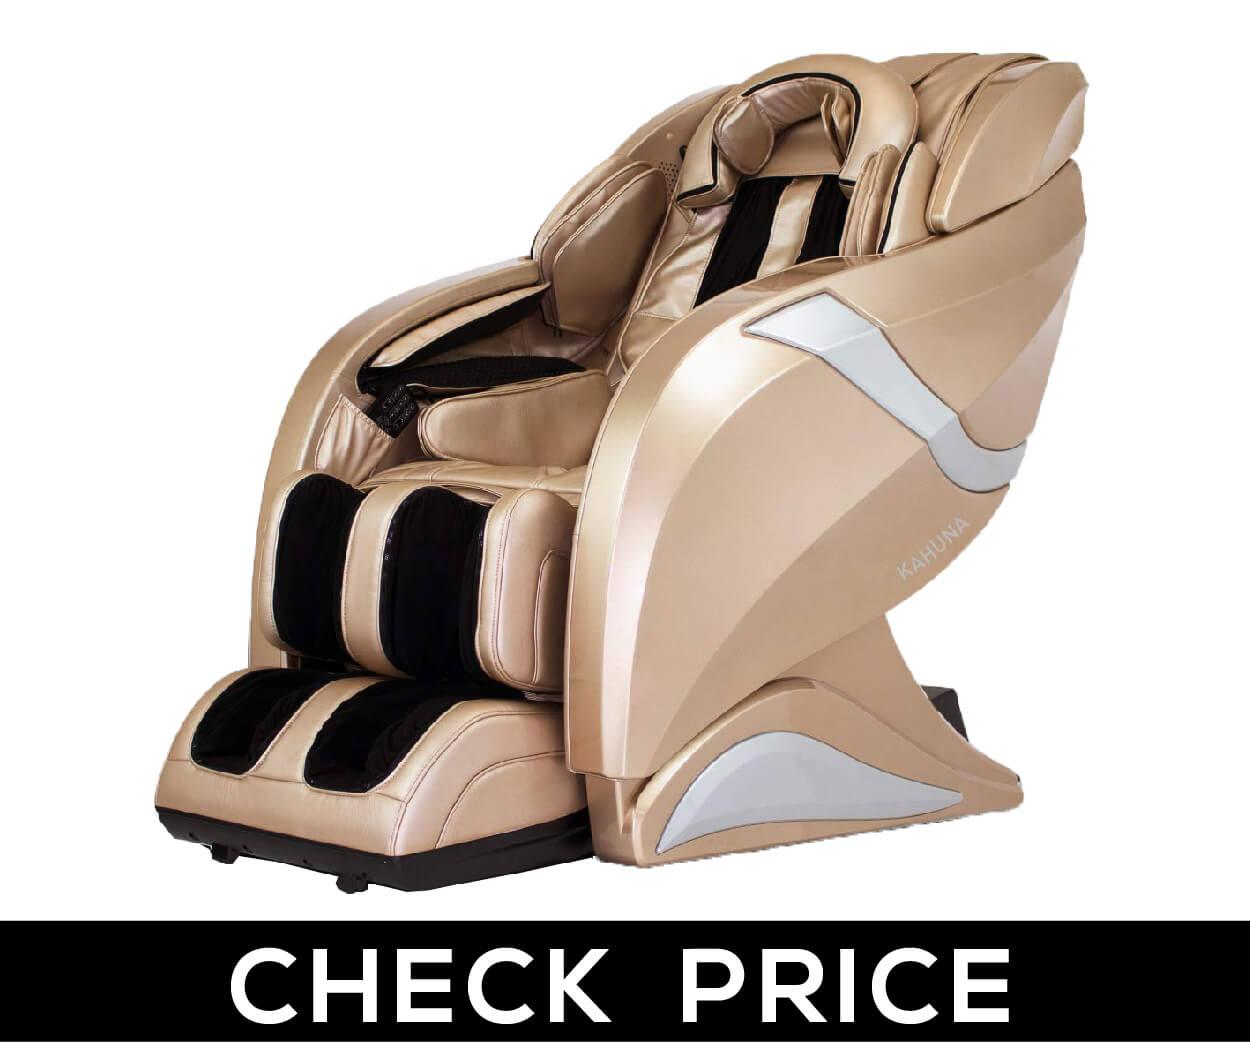 3D Kahuna Exquisite Rhythmic Massage Chair Hubot HM-078